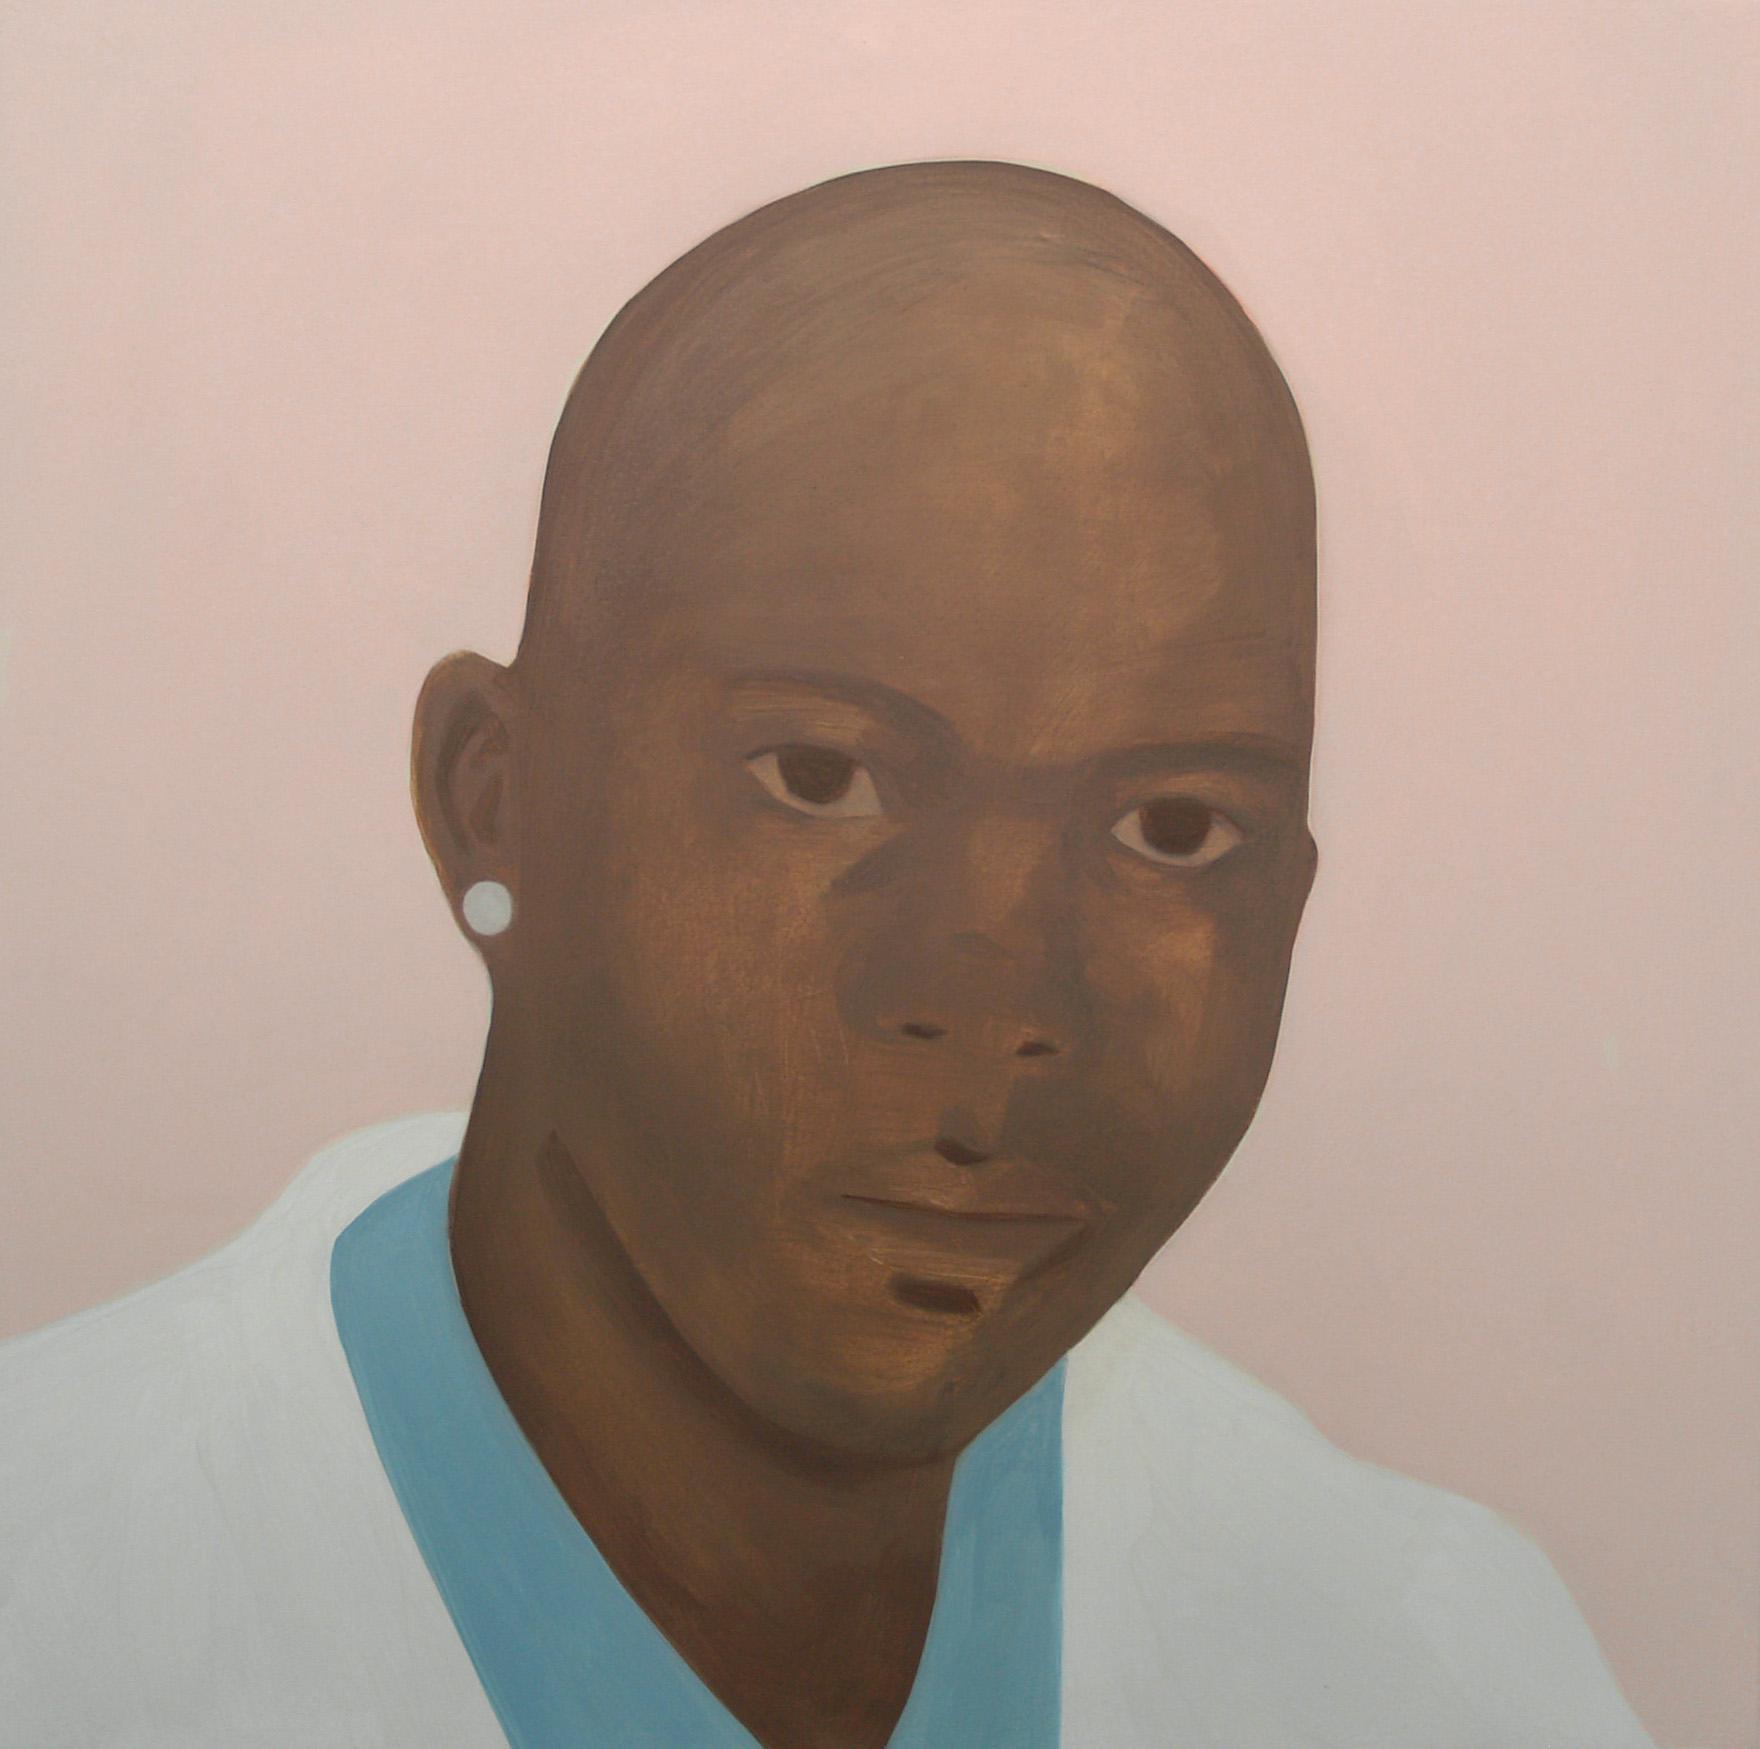 Mido,    Oil on canvas, 50 x 50 cm, 2013